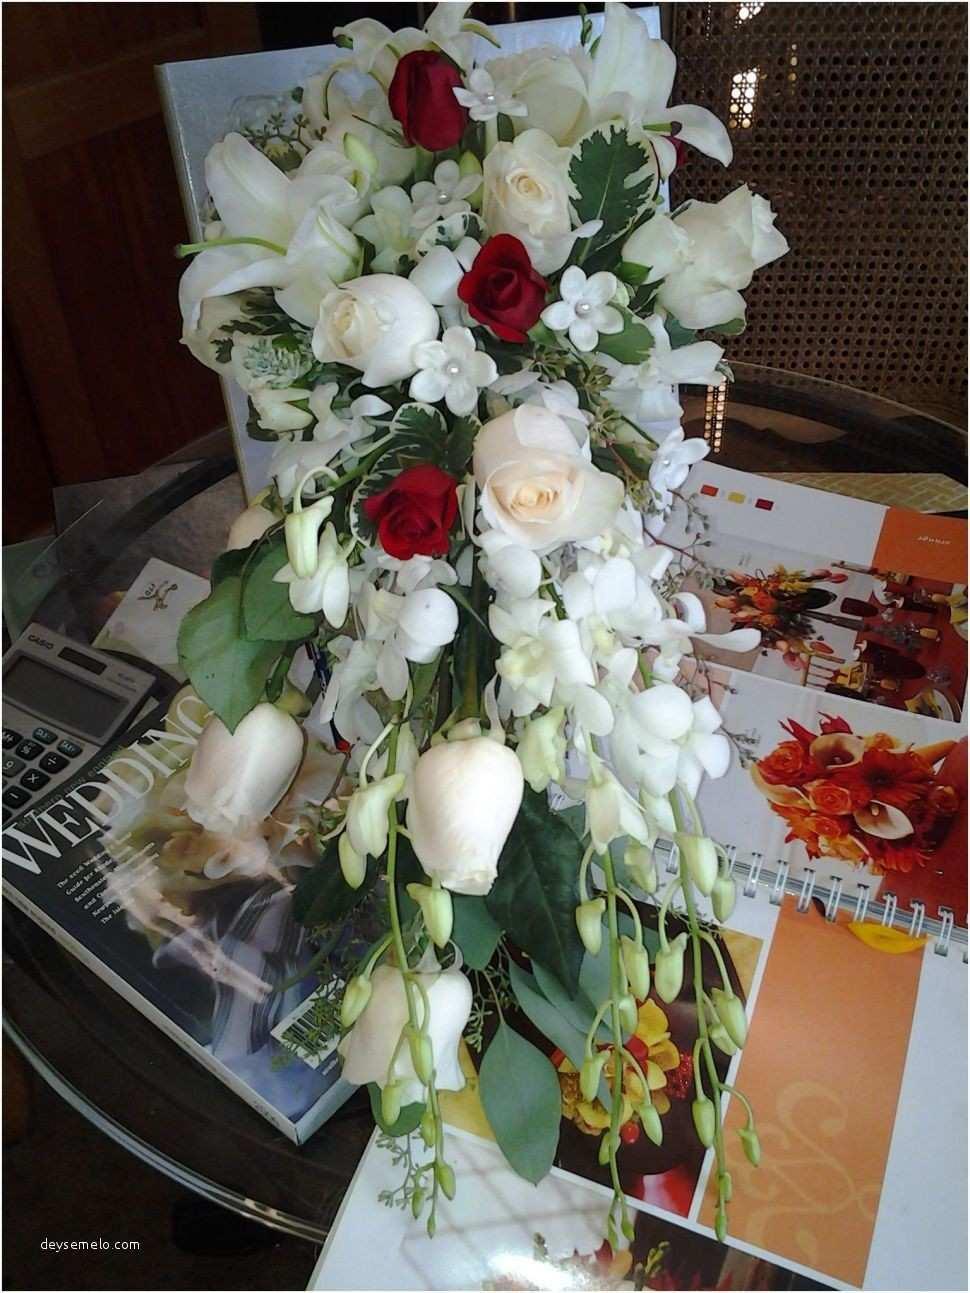 Headstone Vase Flower Arrangements Of Amazing Artificial Flower Bouquet and Fake Flowers Fascinating H for Amazing Artificial Flower Bouquet and Artificial Flower Bouquet Archaicawful A Beautiful Cascade Bouquet